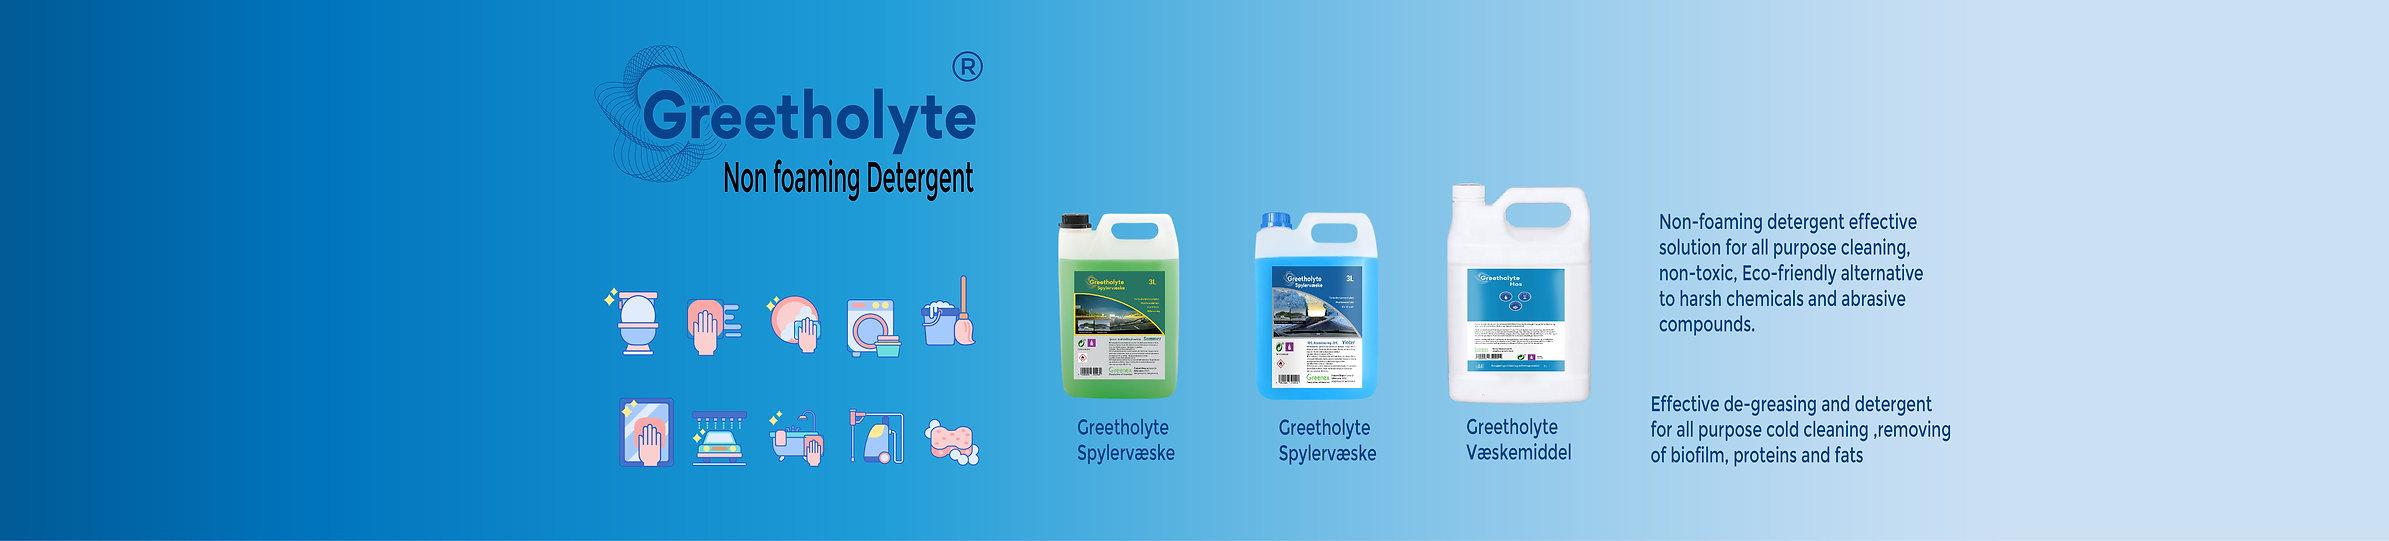 Products Greenolyte-04.jpg